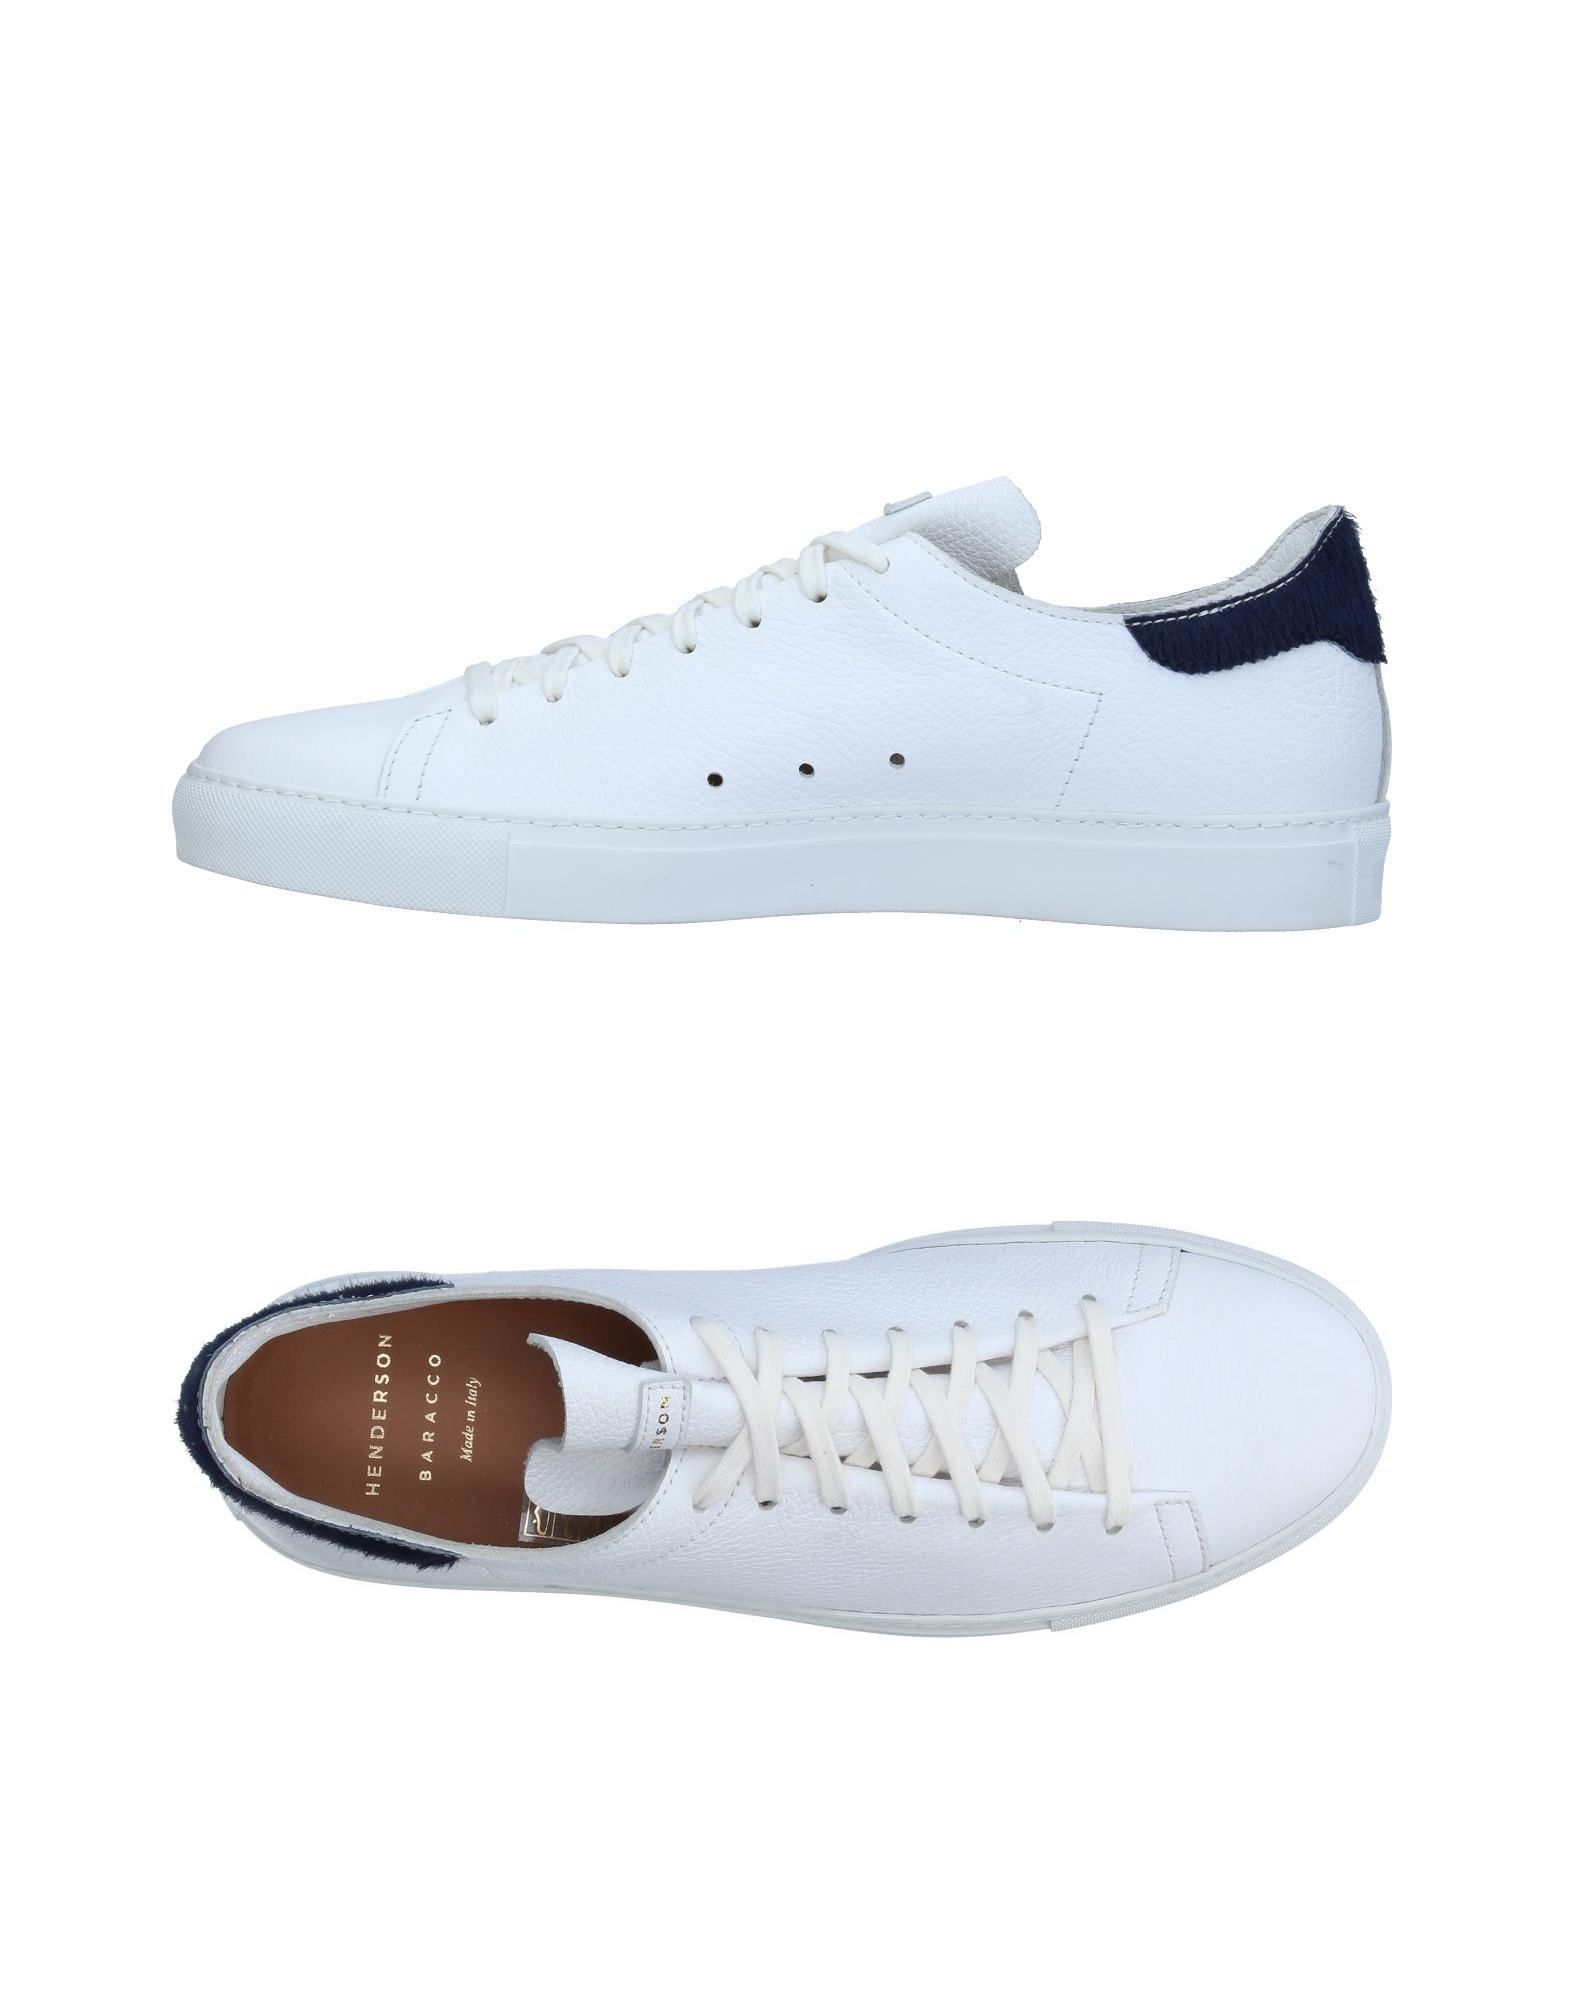 HENDERSON BARACCO Низкие кеды и кроссовки цены онлайн